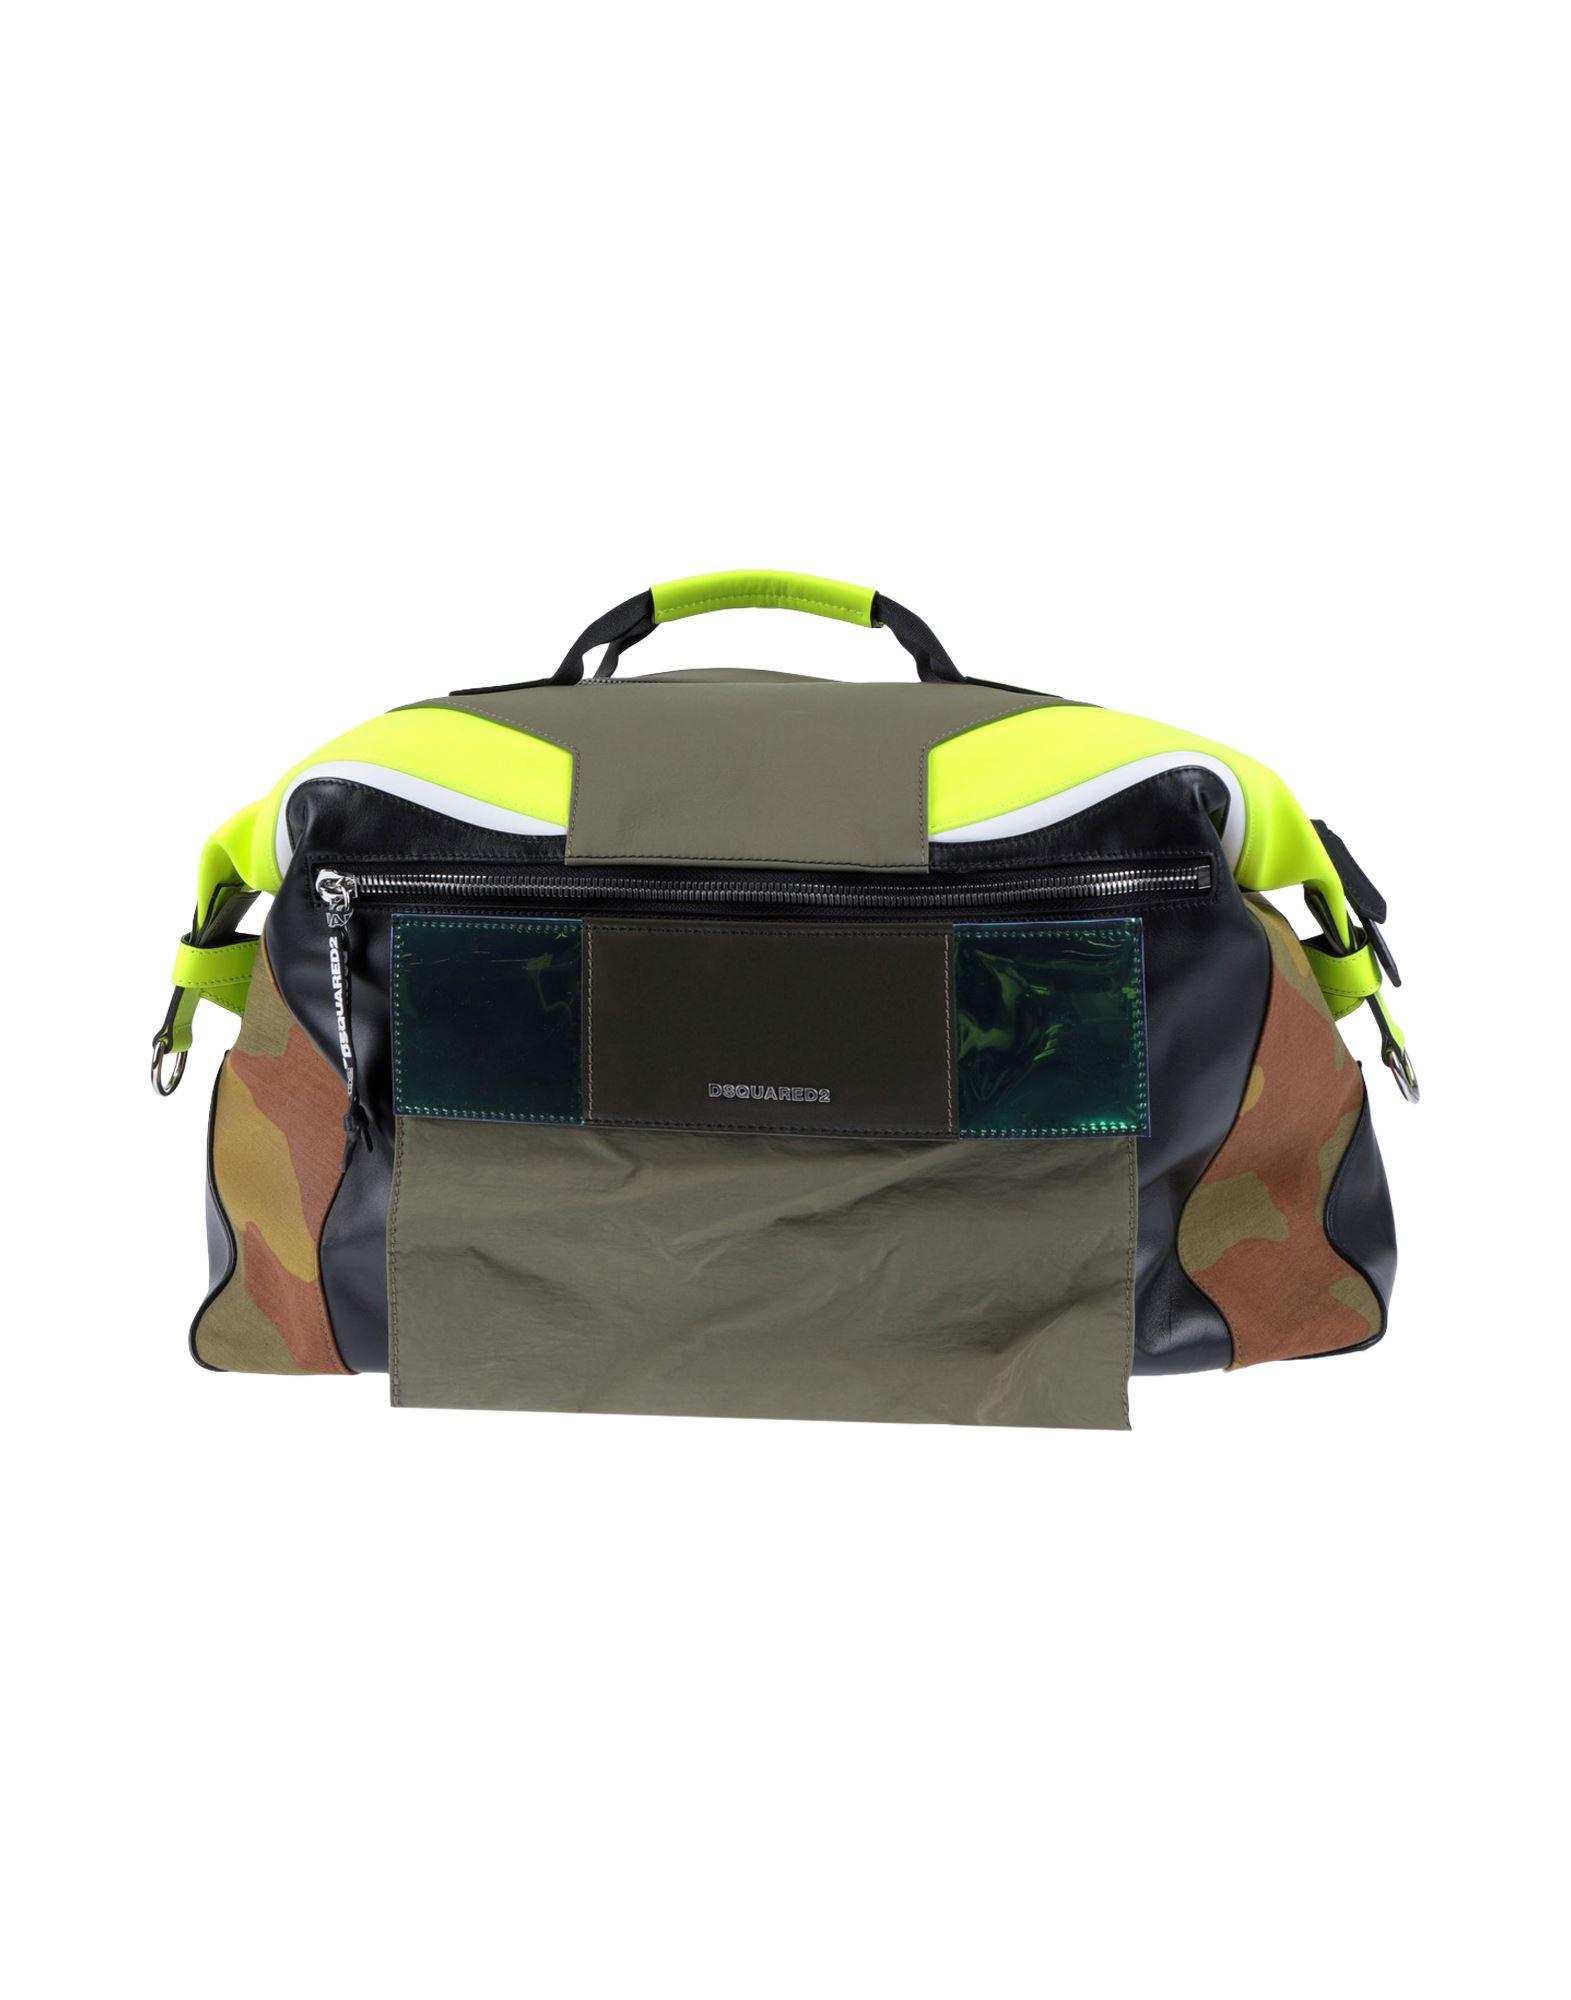 DSQUARED2 Travel duffel bags - Item 55020383